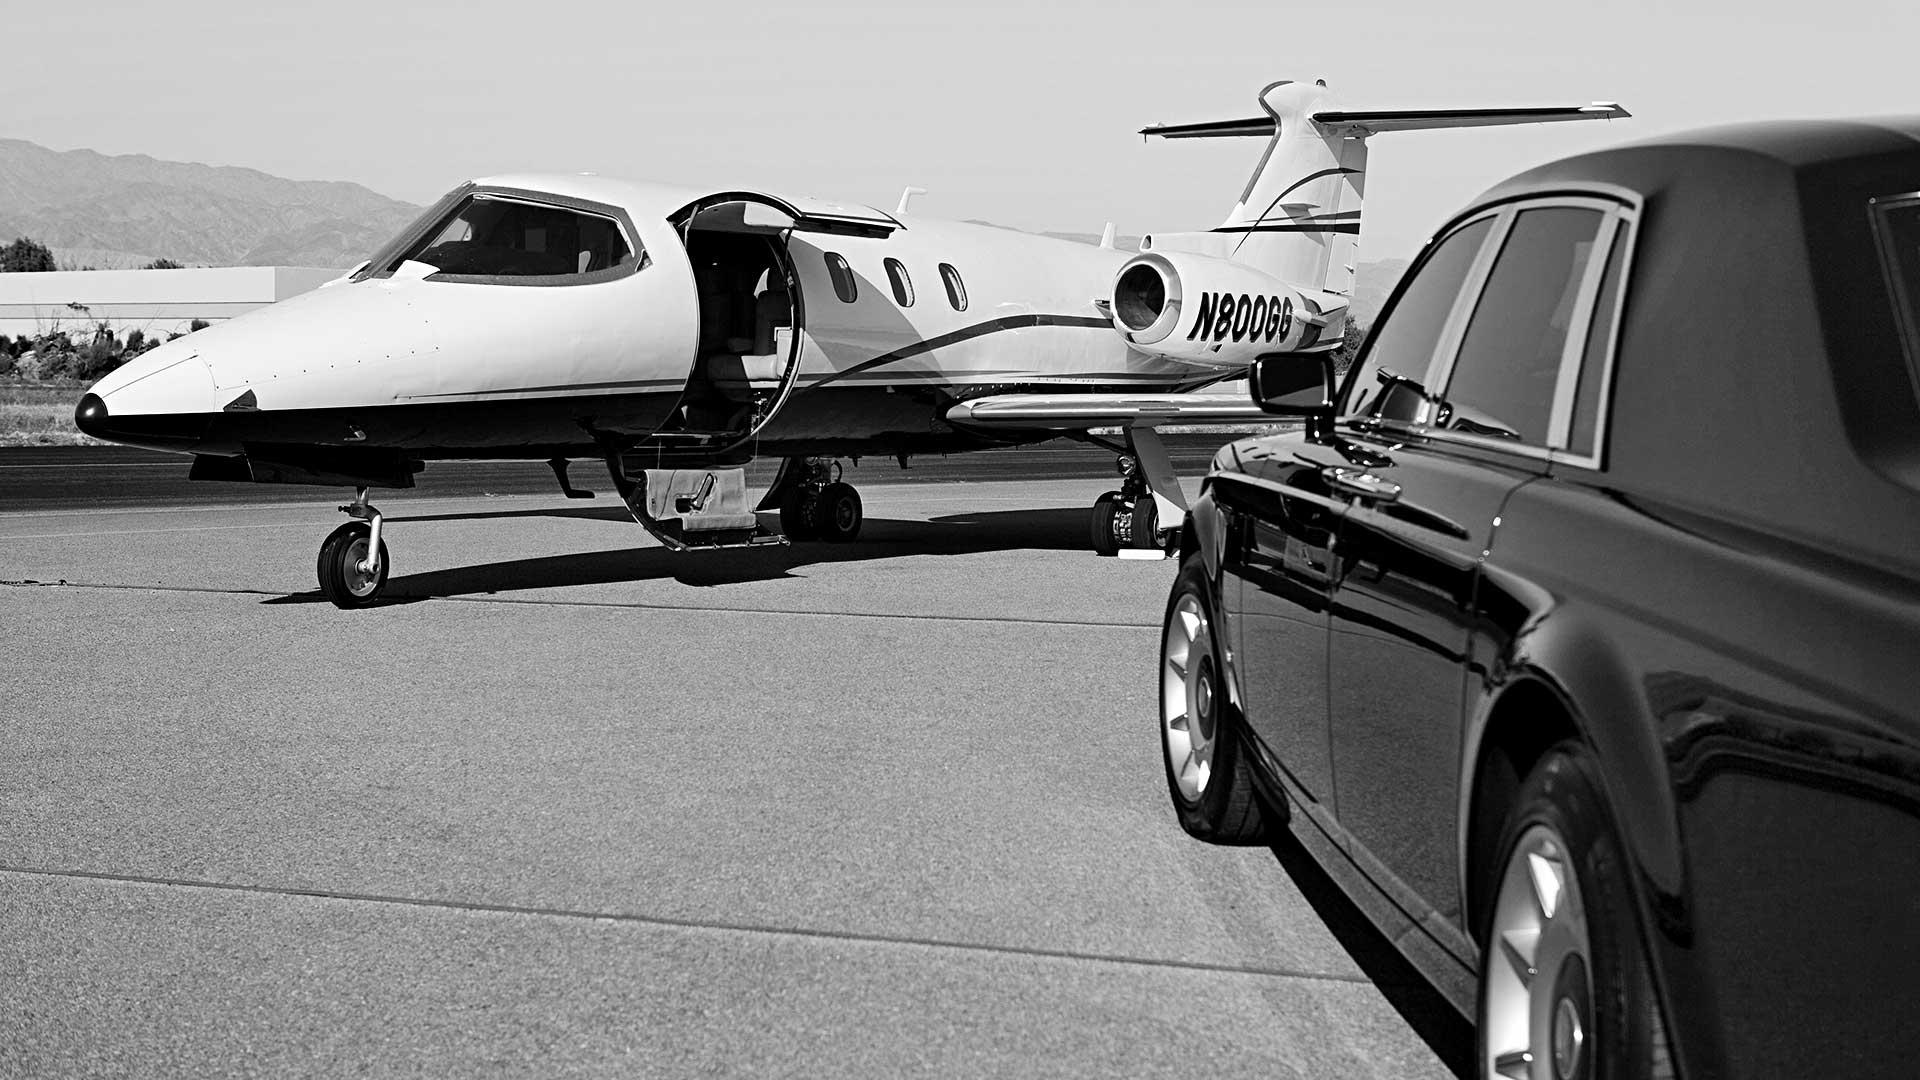 Airport Pick-up Limousine Service (black limo)